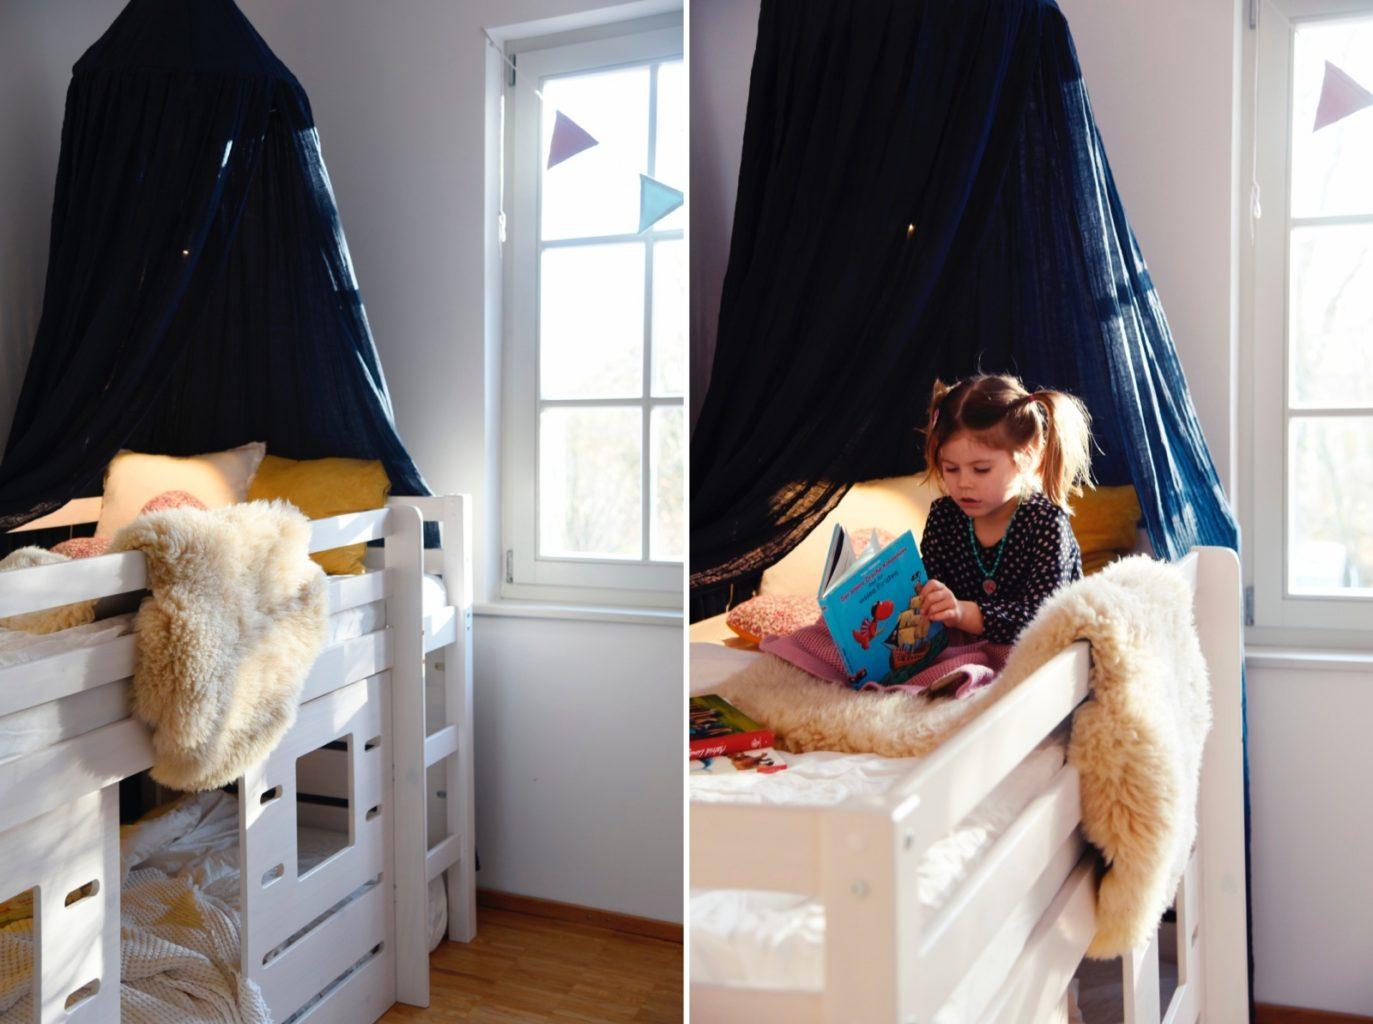 Full Size of Kinderzimmer Hochbett Hurra Sofa Regal Weiß Regale Kinderzimmer Kinderzimmer Hochbett